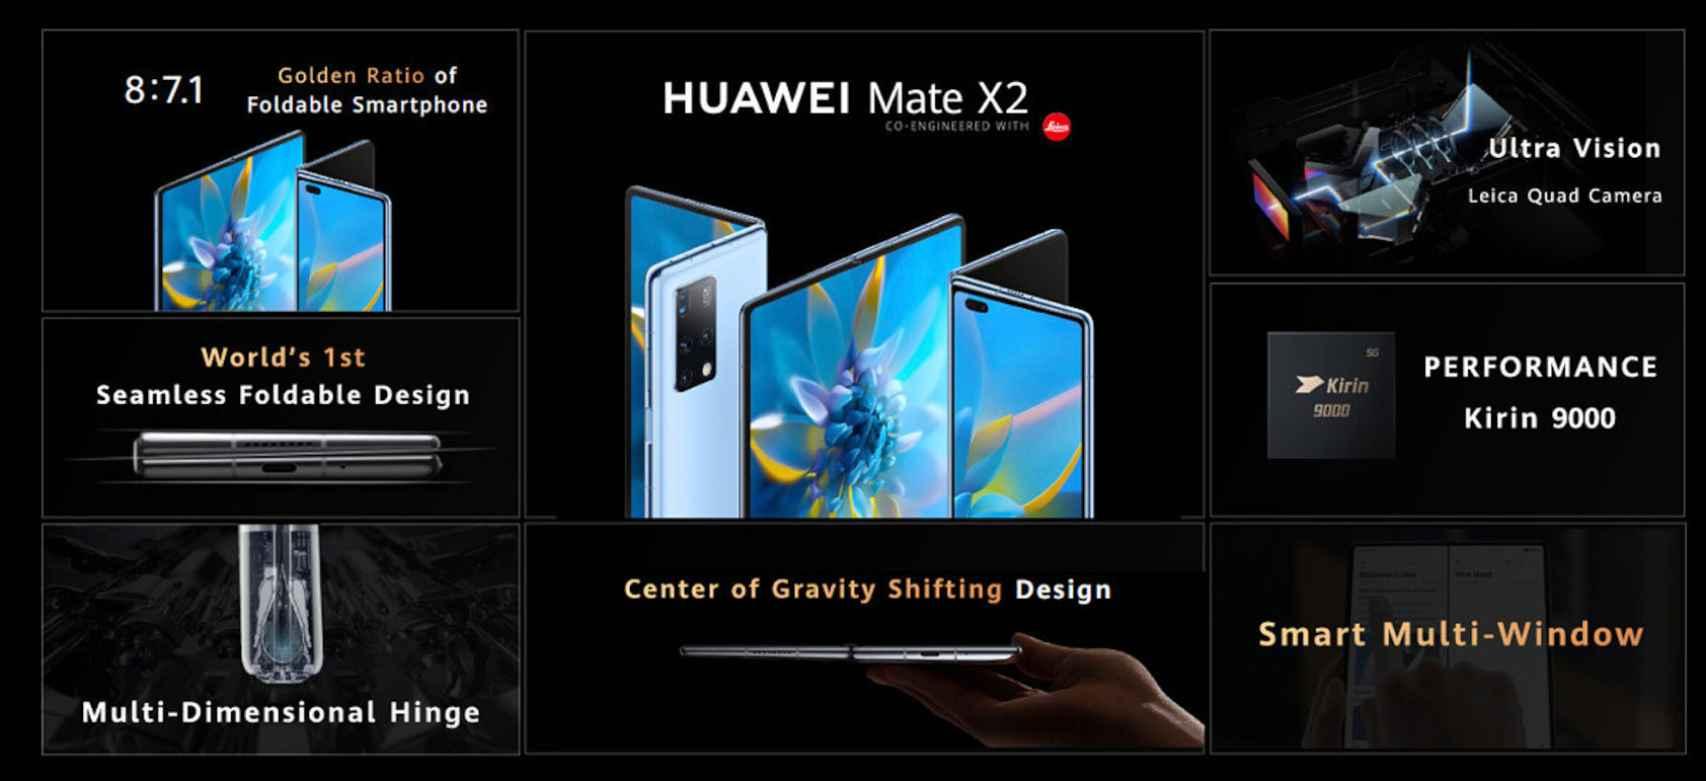 Características del Huawei Mate X2